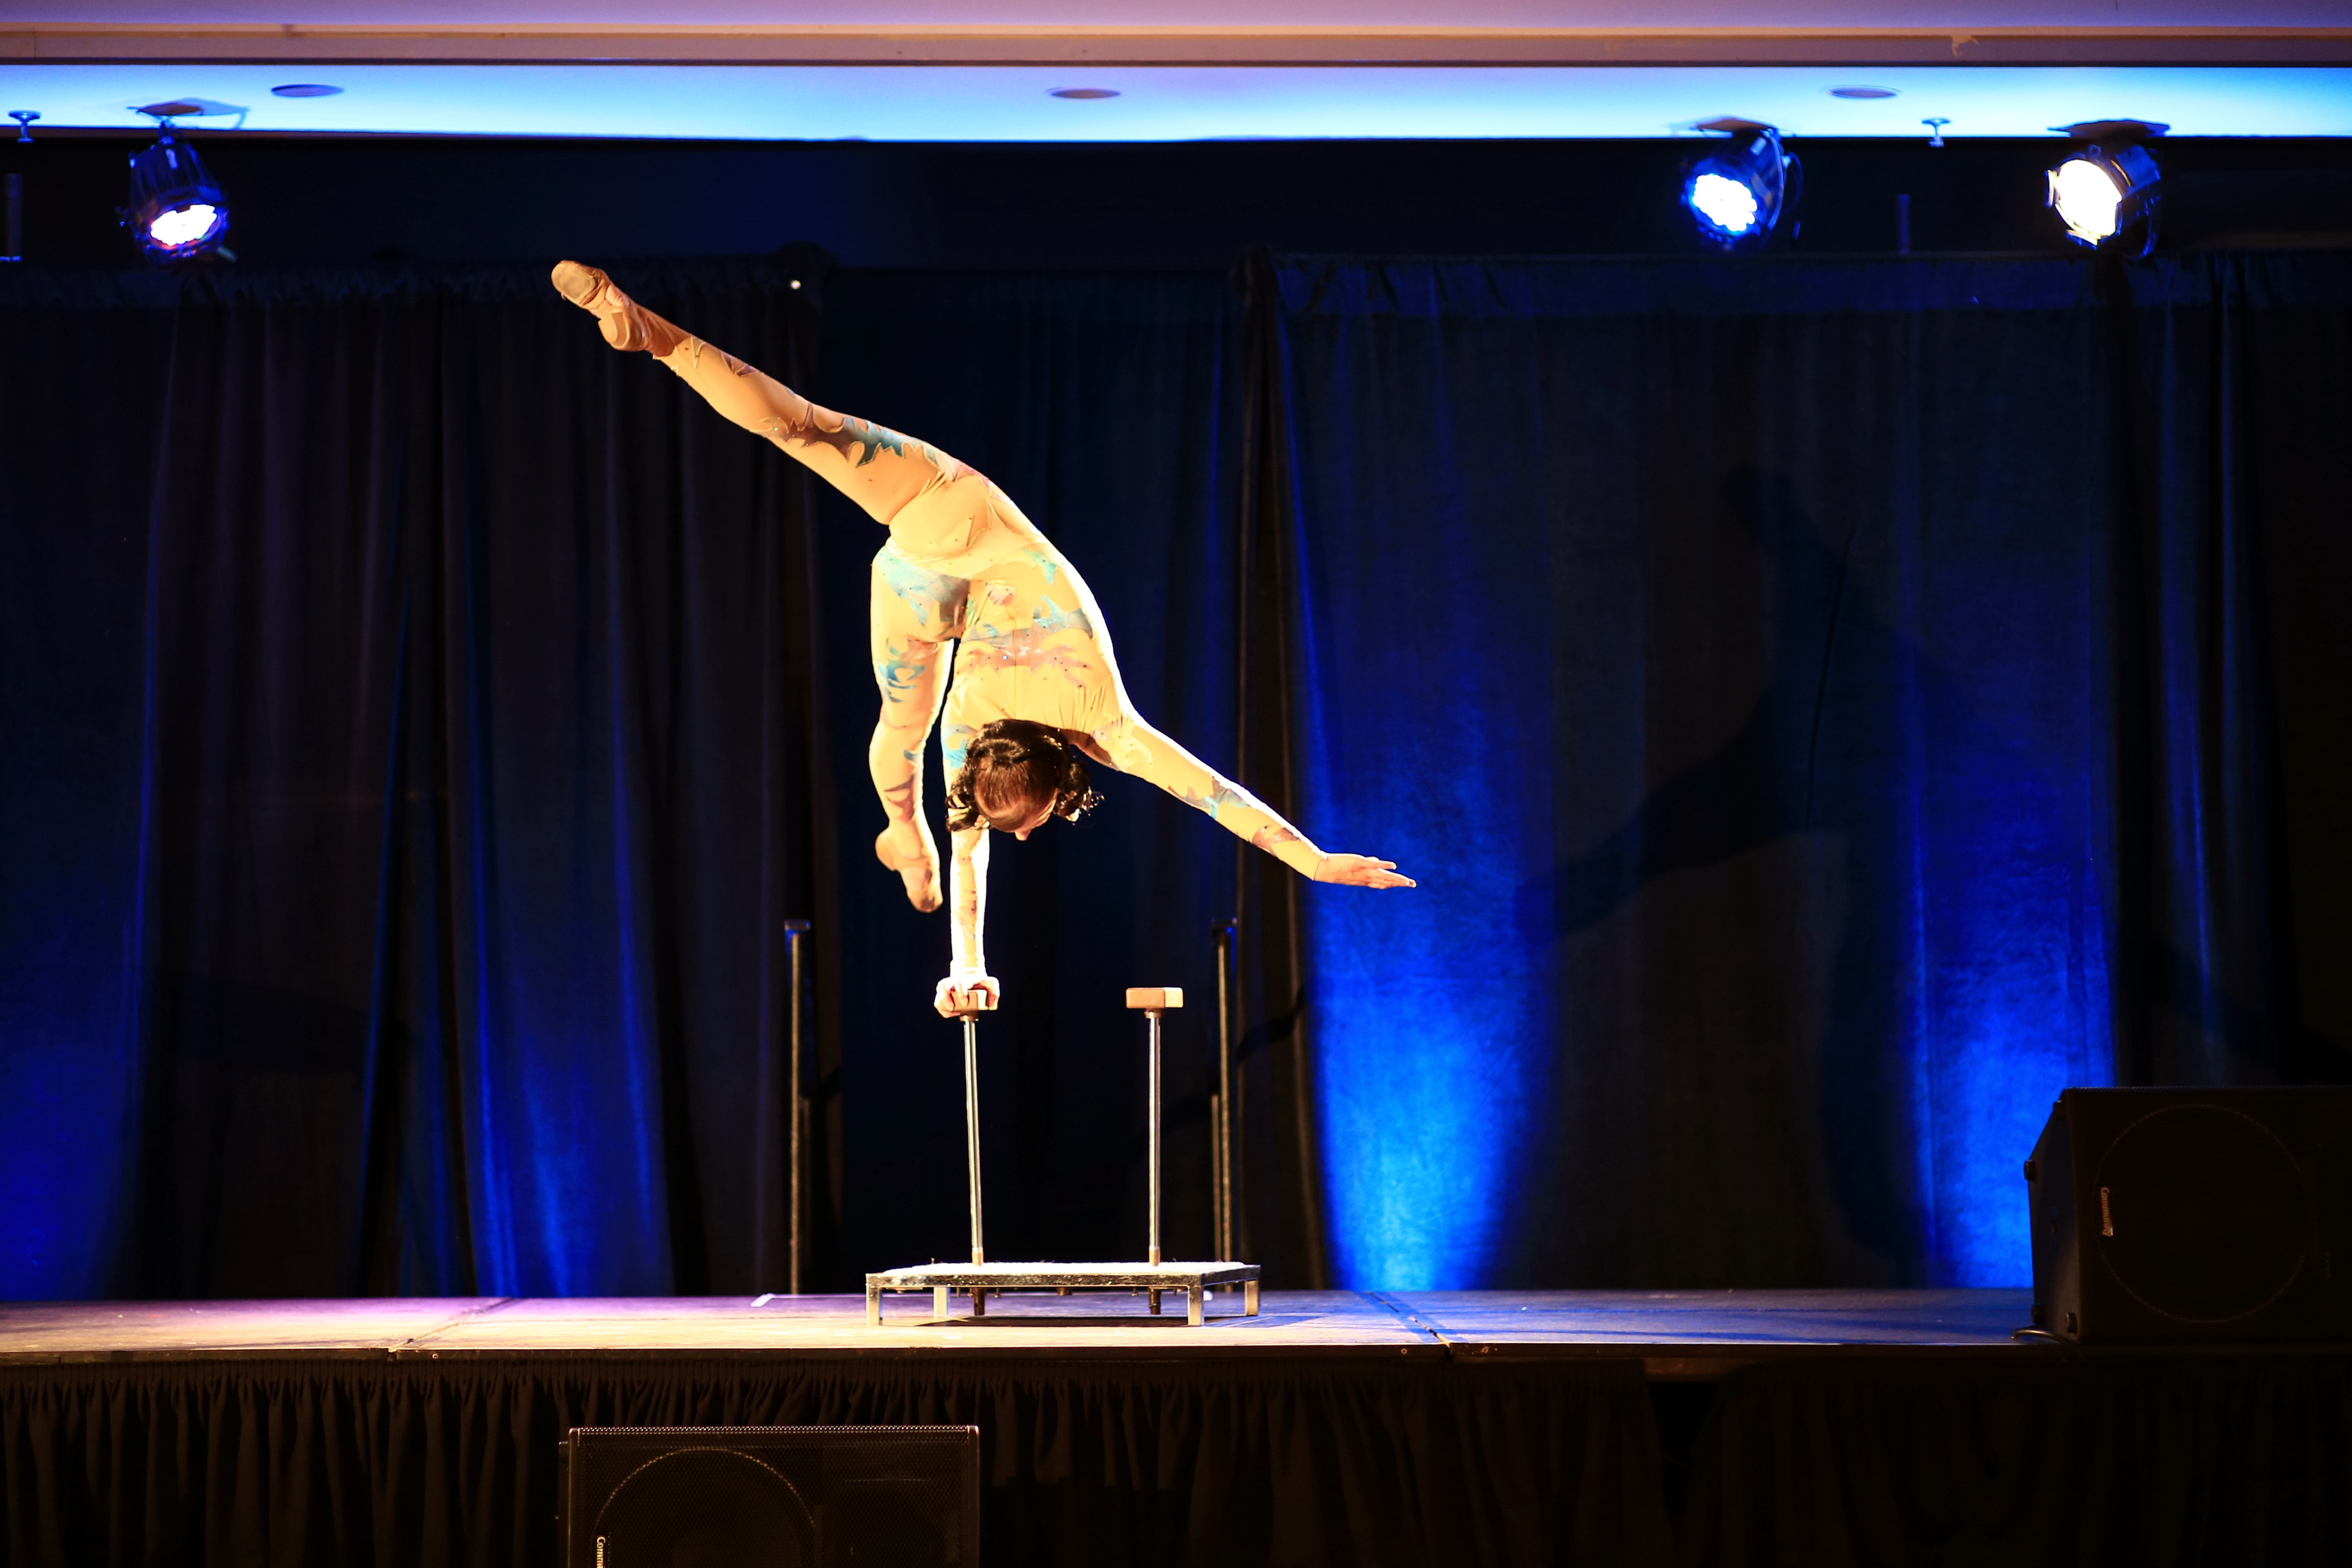 Handstand Balancing Act